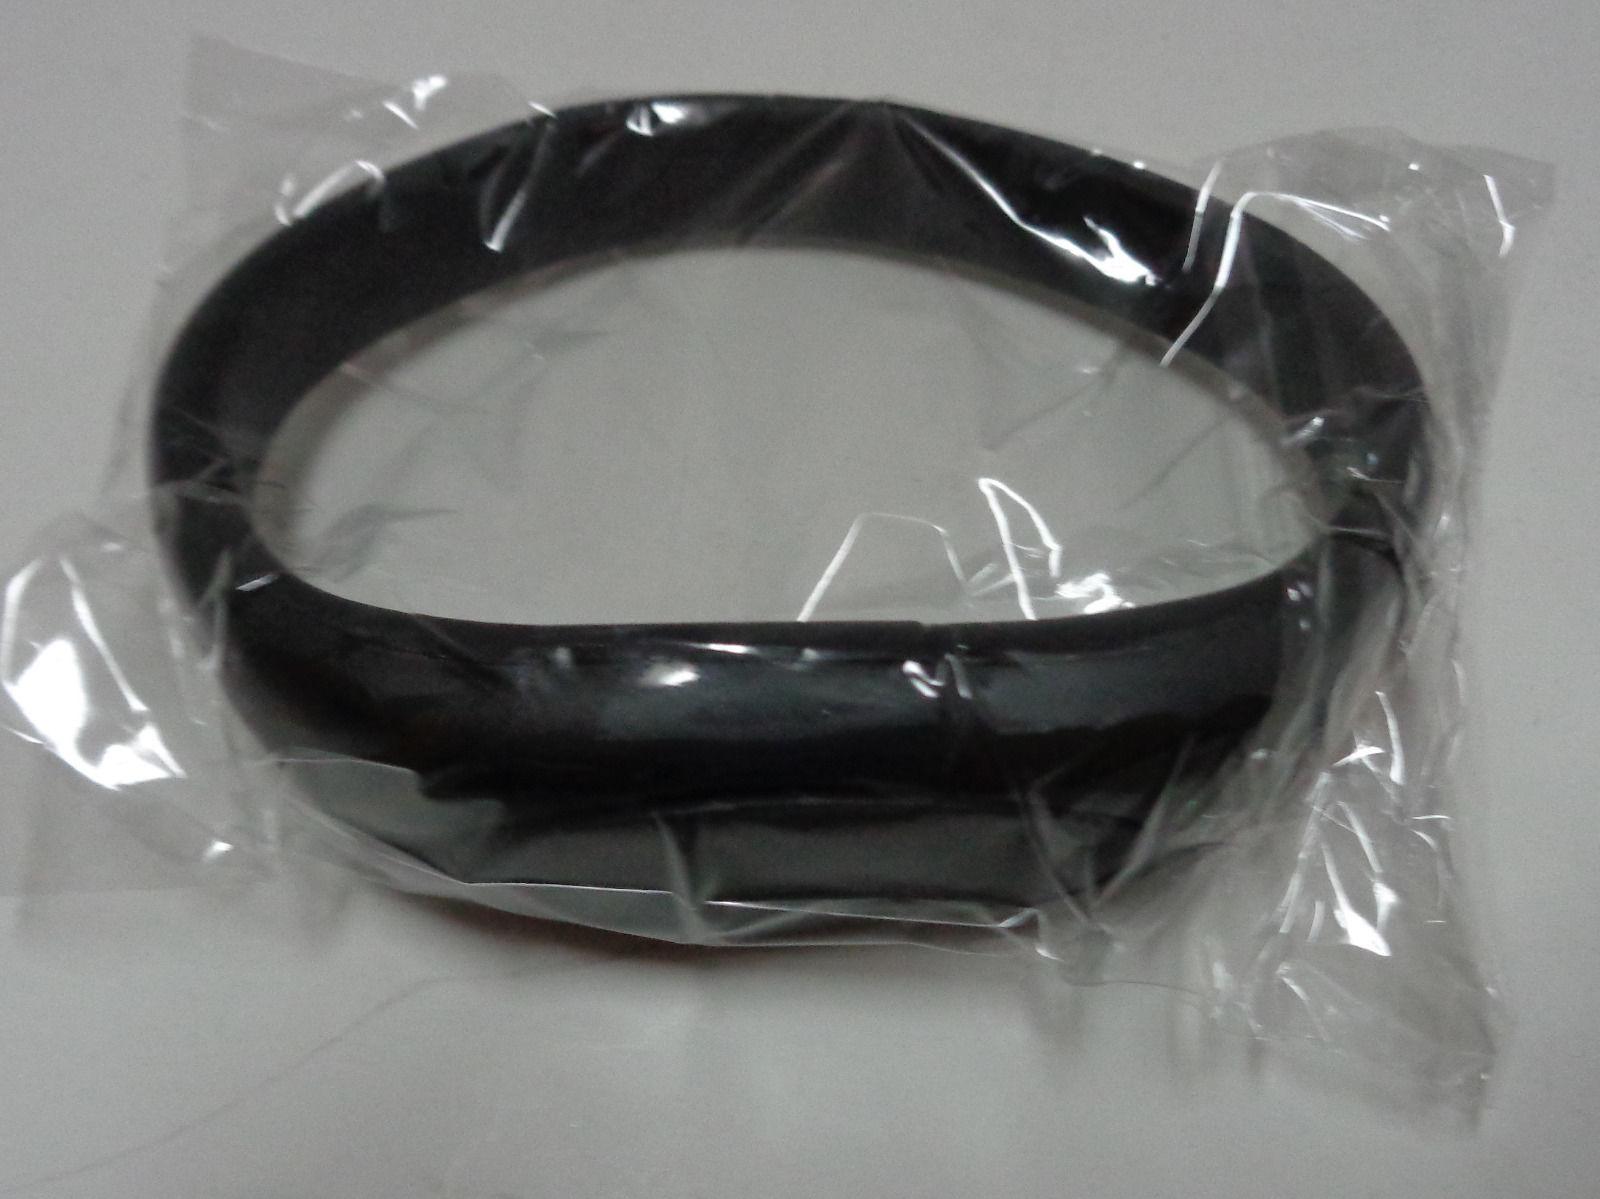 16 GB USB 2.0 Memory Stick Flash Pen Drive Black Wristband Bracelet NWT